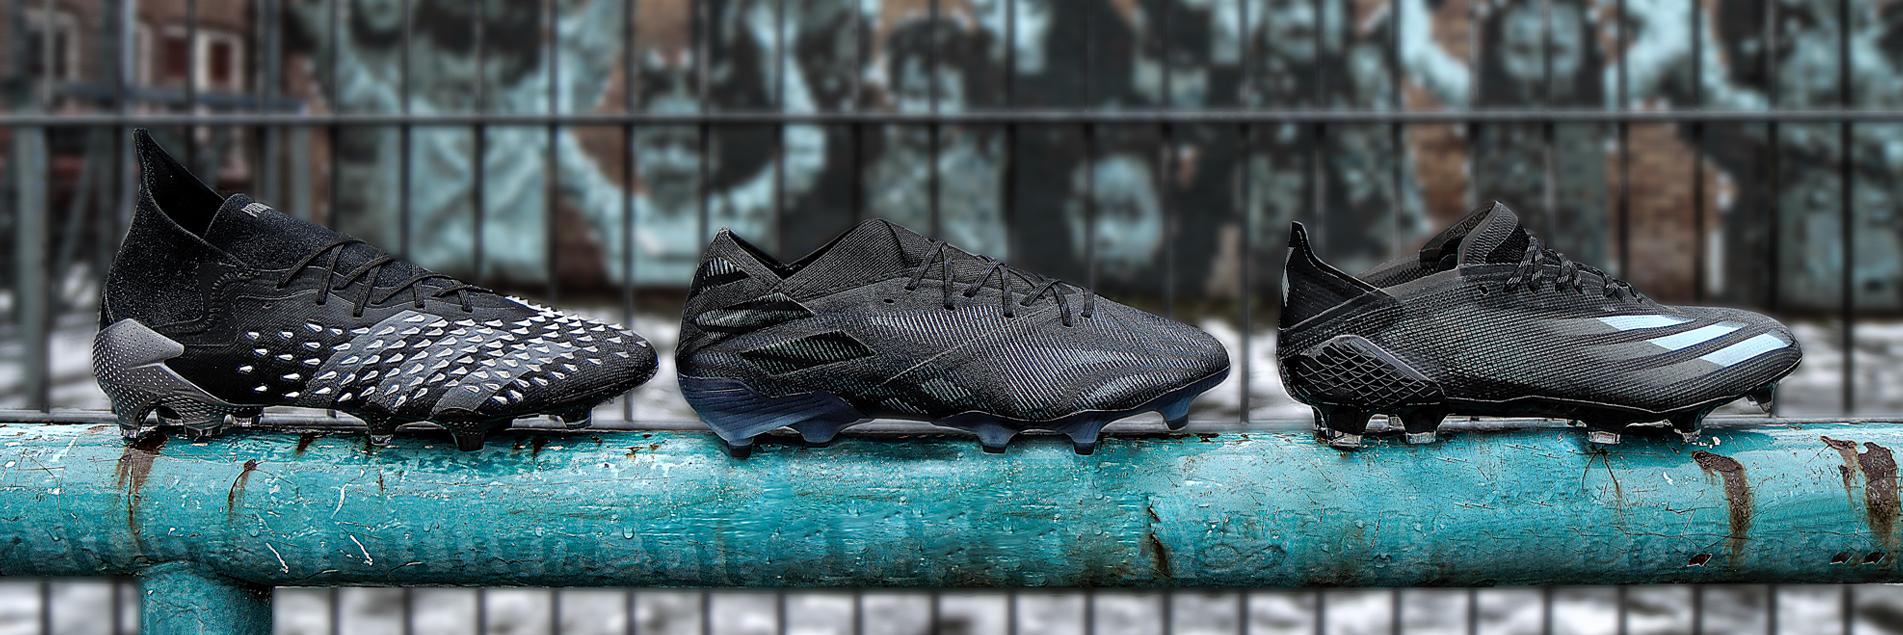 adidas Super Stealth